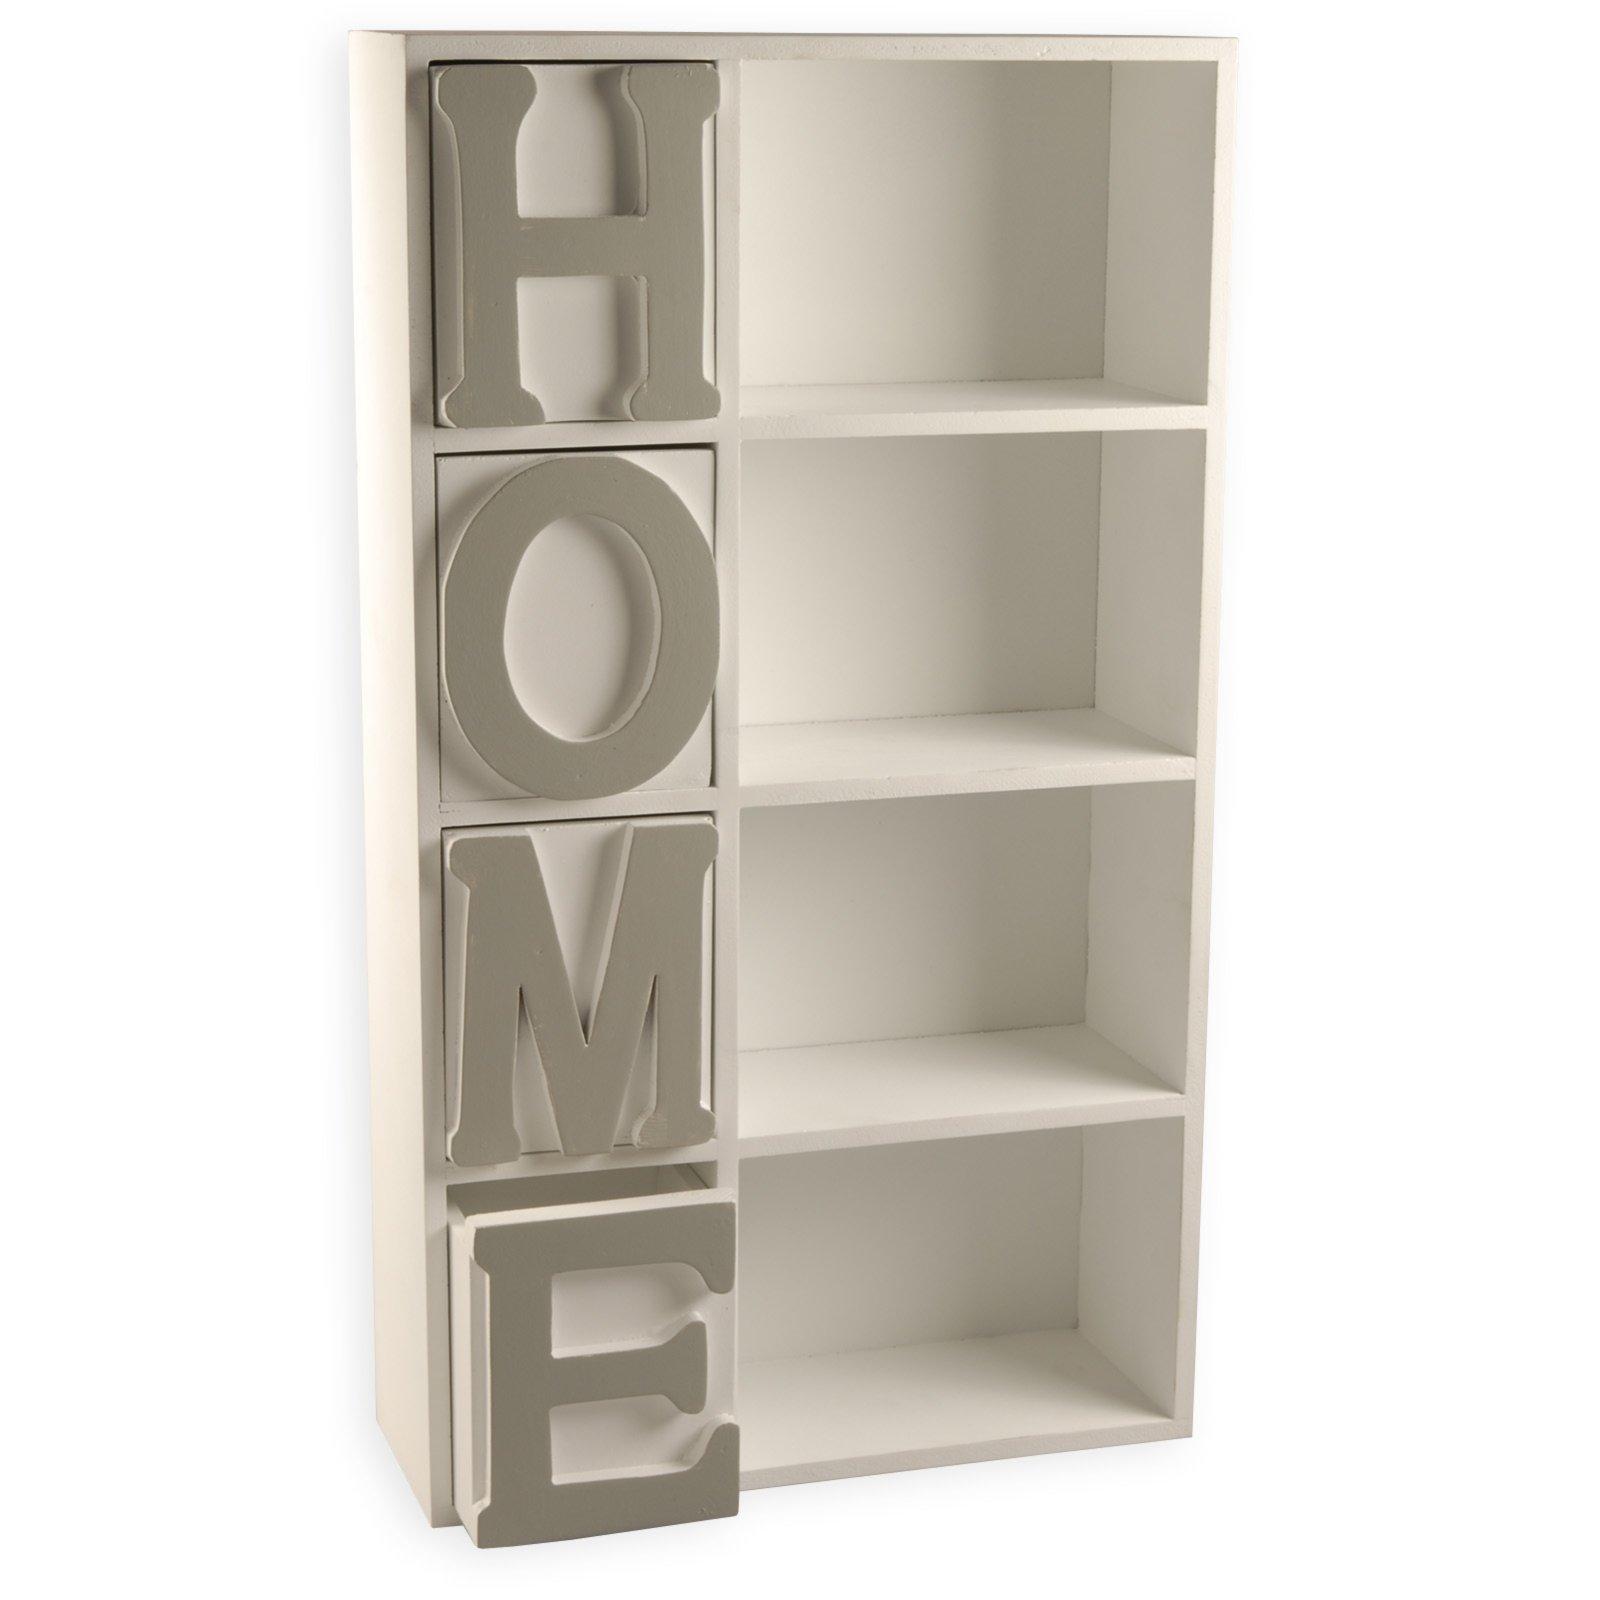 wandregal home wei grau 30x53 cm wandregale. Black Bedroom Furniture Sets. Home Design Ideas